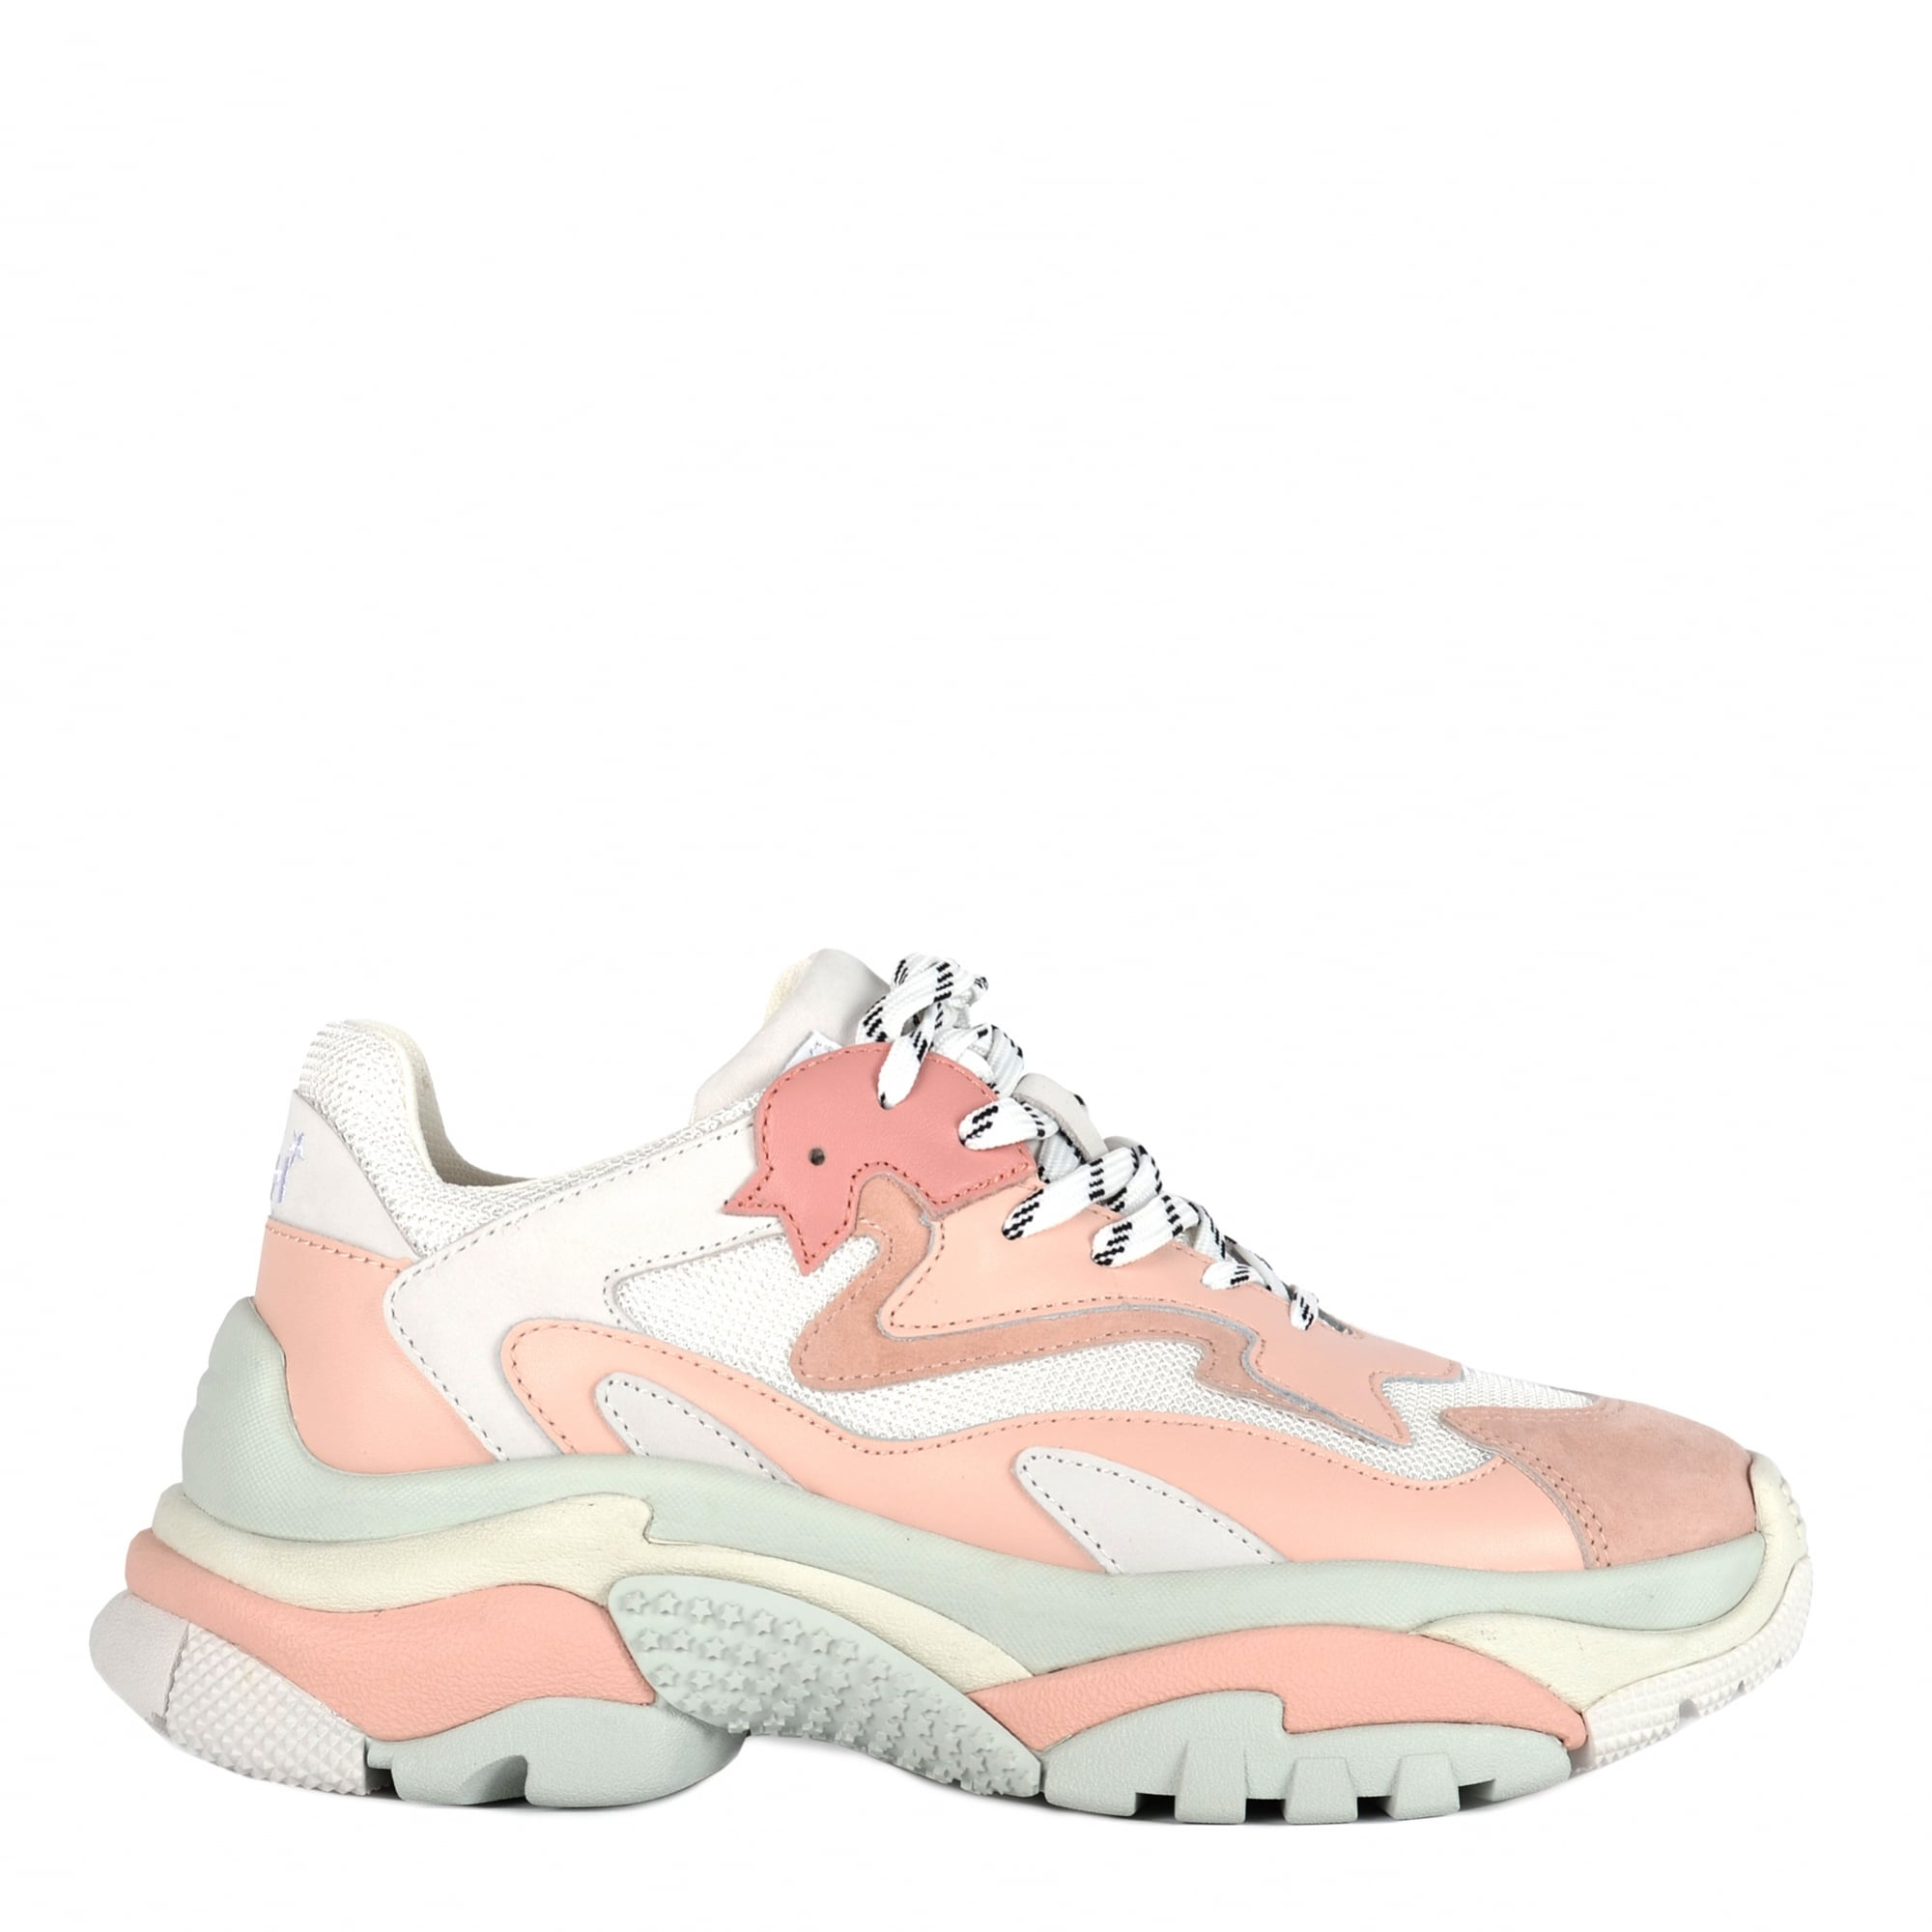 Shop Women's Pink \u0026 White Sneakers